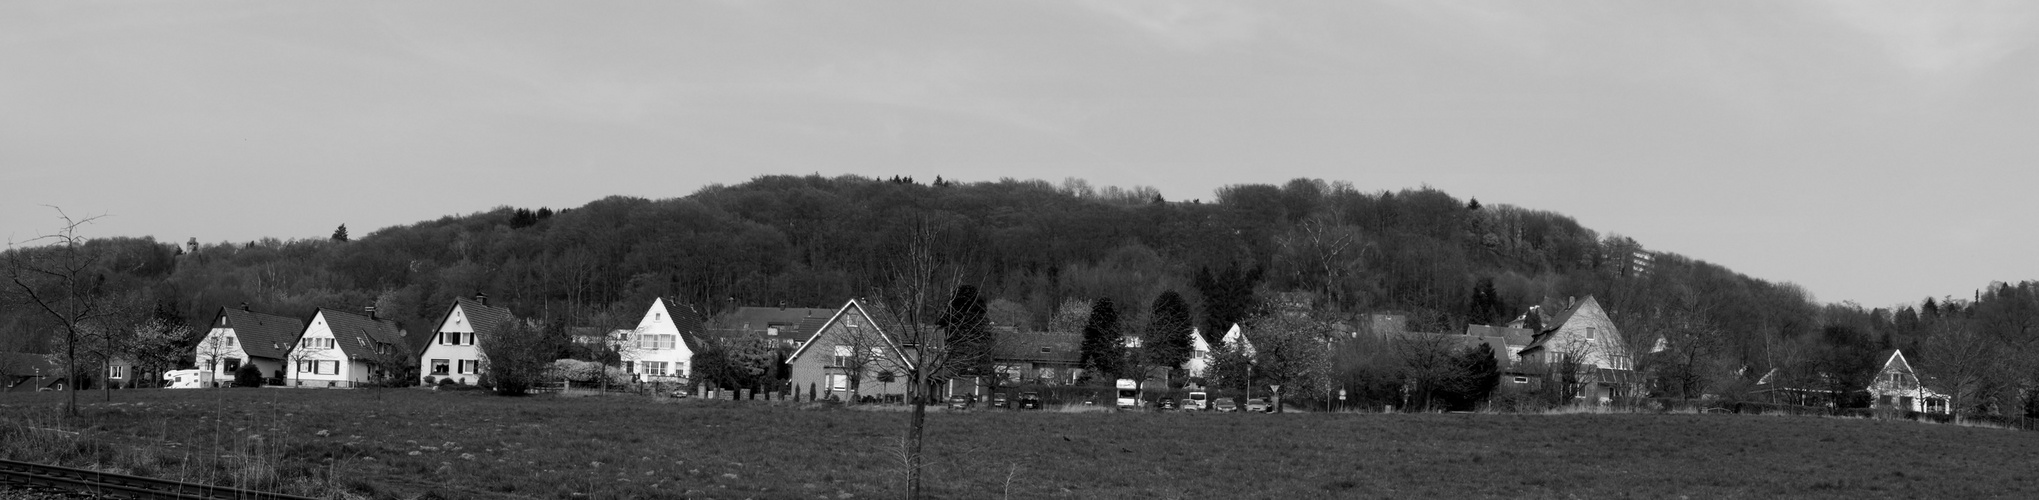 panorama tecklenburg von haus marck